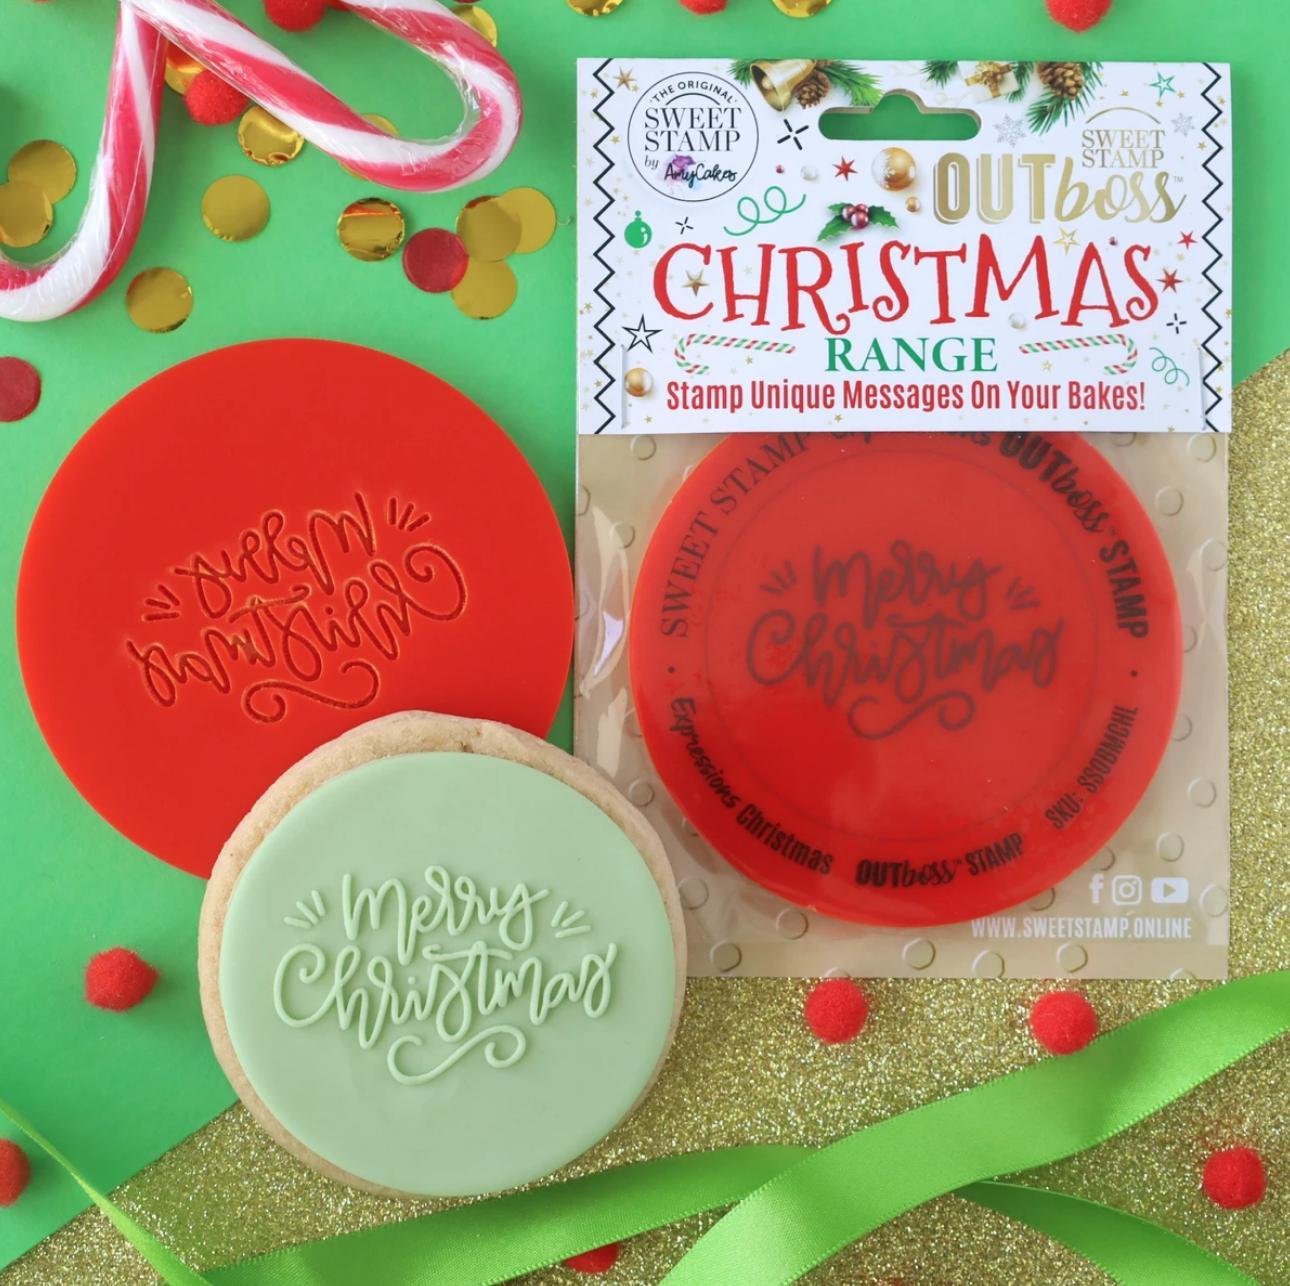 OUTBOSS CHRISTMAS - MERRY CHRISTMAS ELEGANT